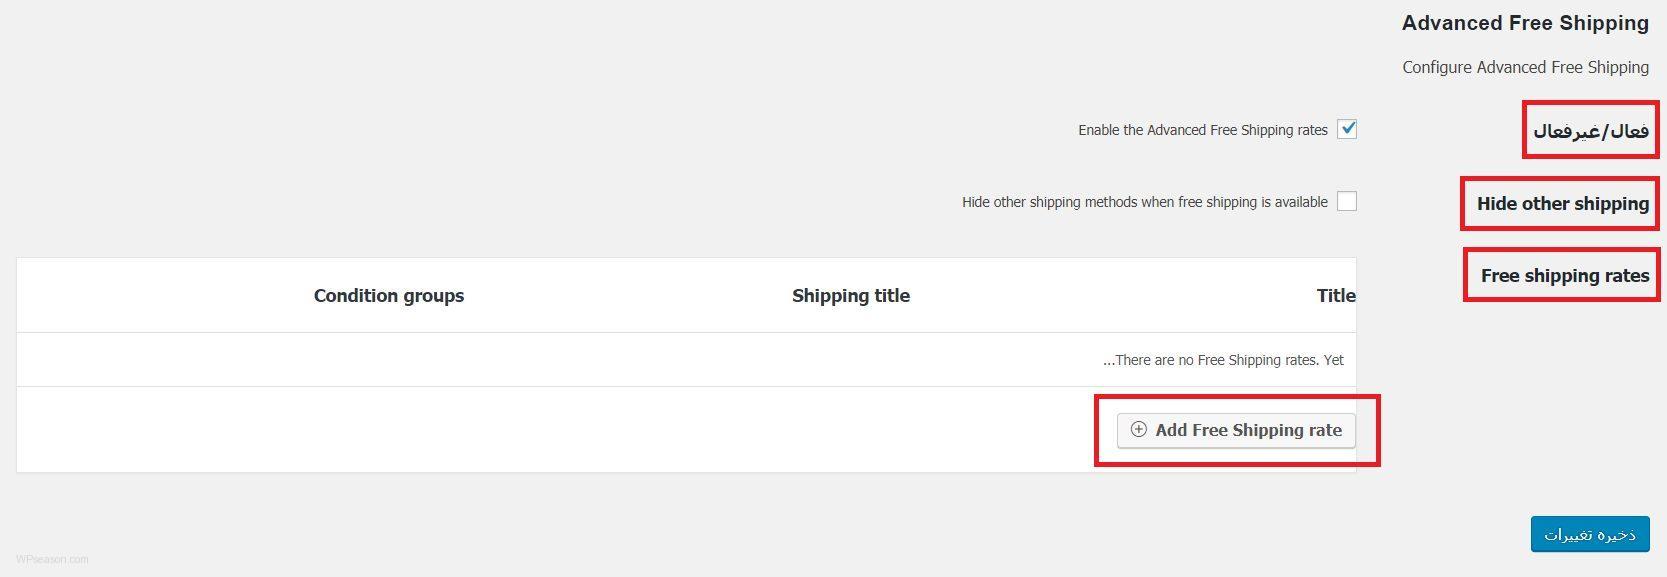 WooCommerce Advanced Free Shipping Settings